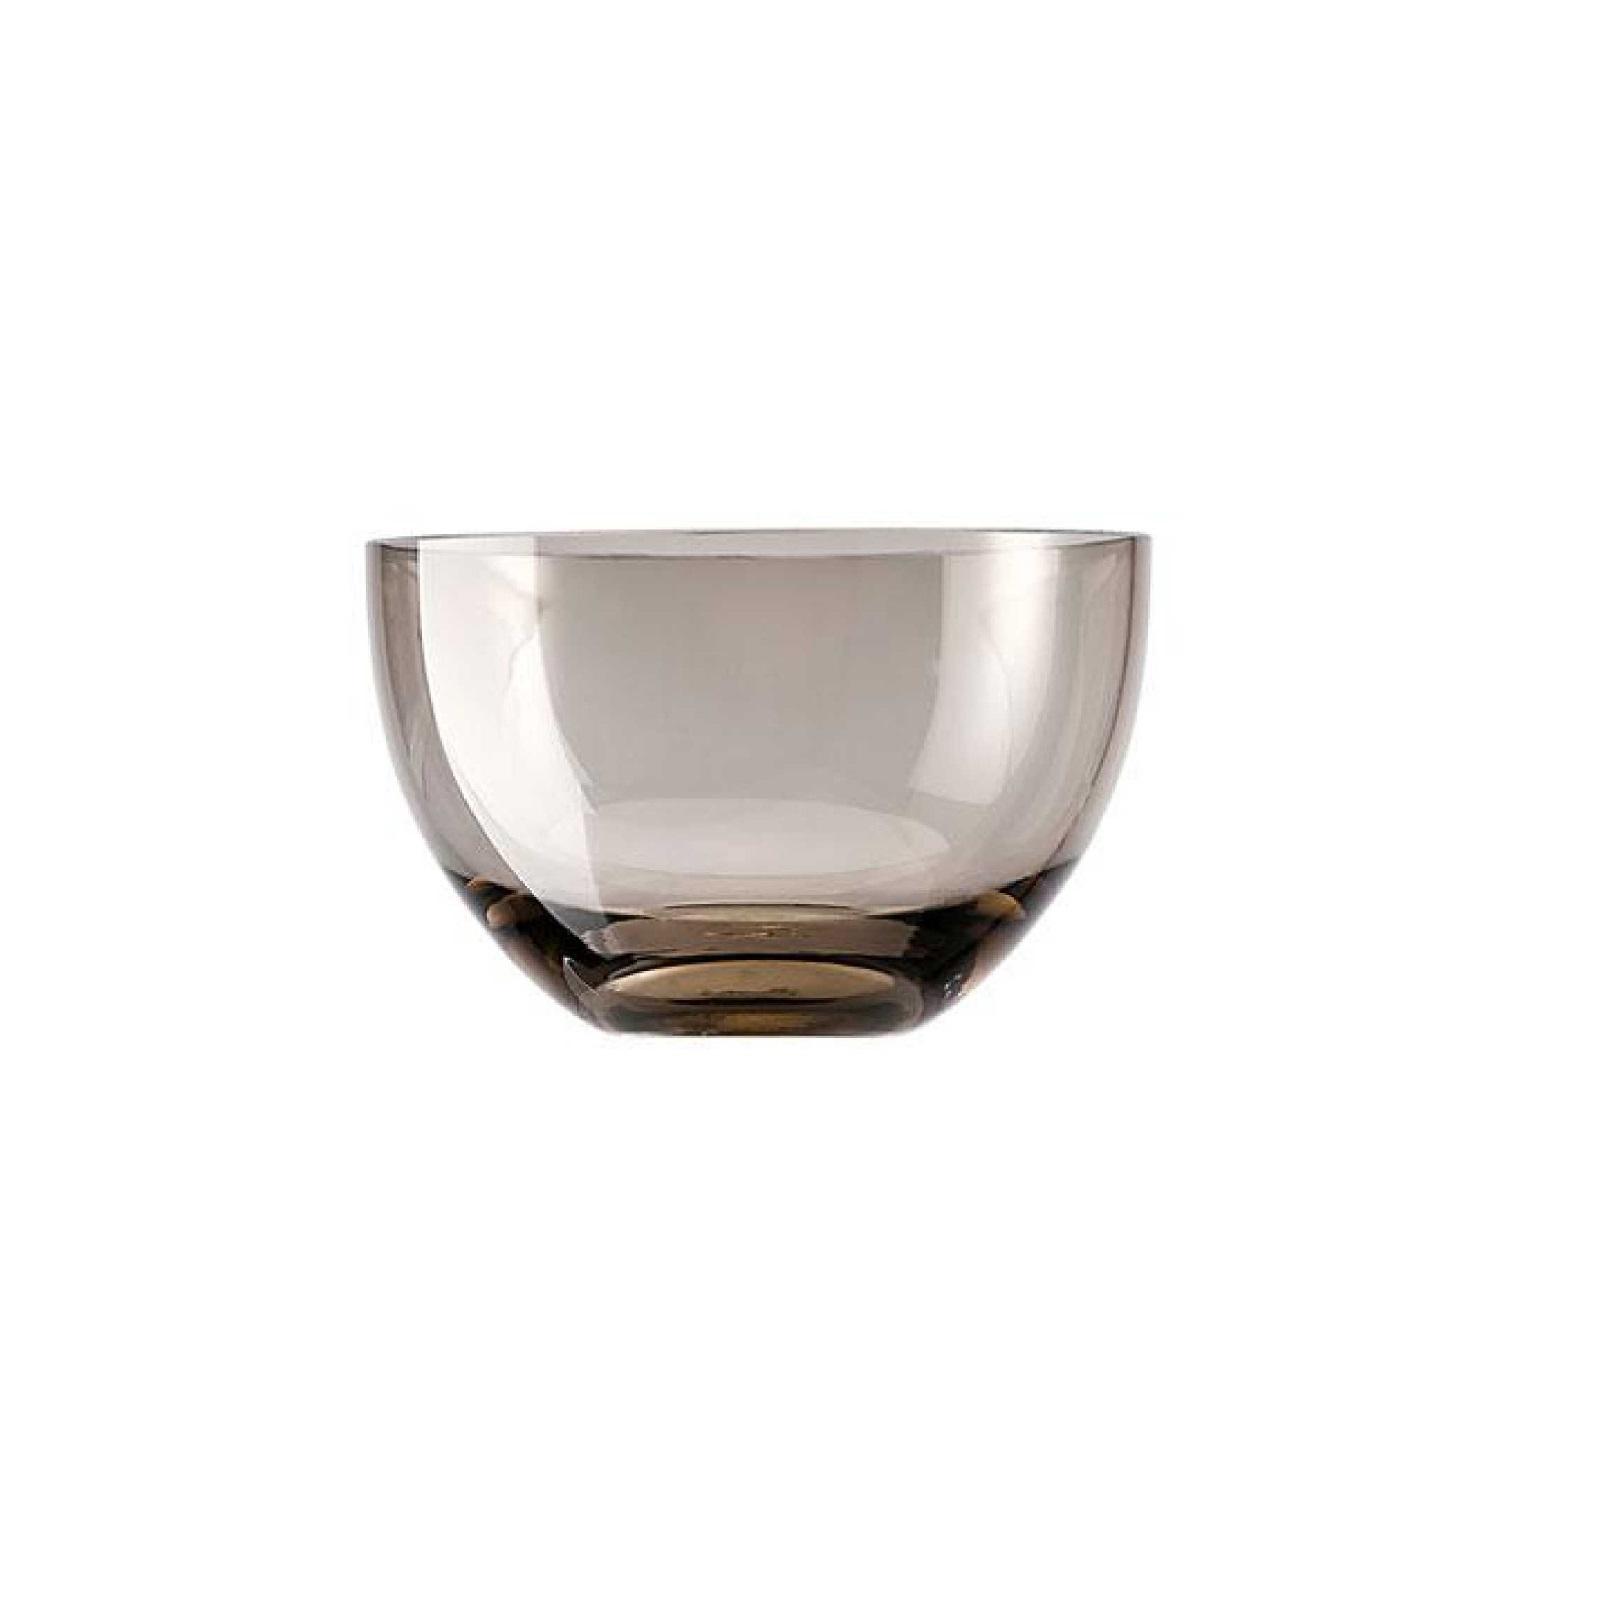 Пиала стеклянная Rosenthal SUNNY DAY, диаметр 12 см, коричневый Rosenthal 69034-408526-45312 фото 2